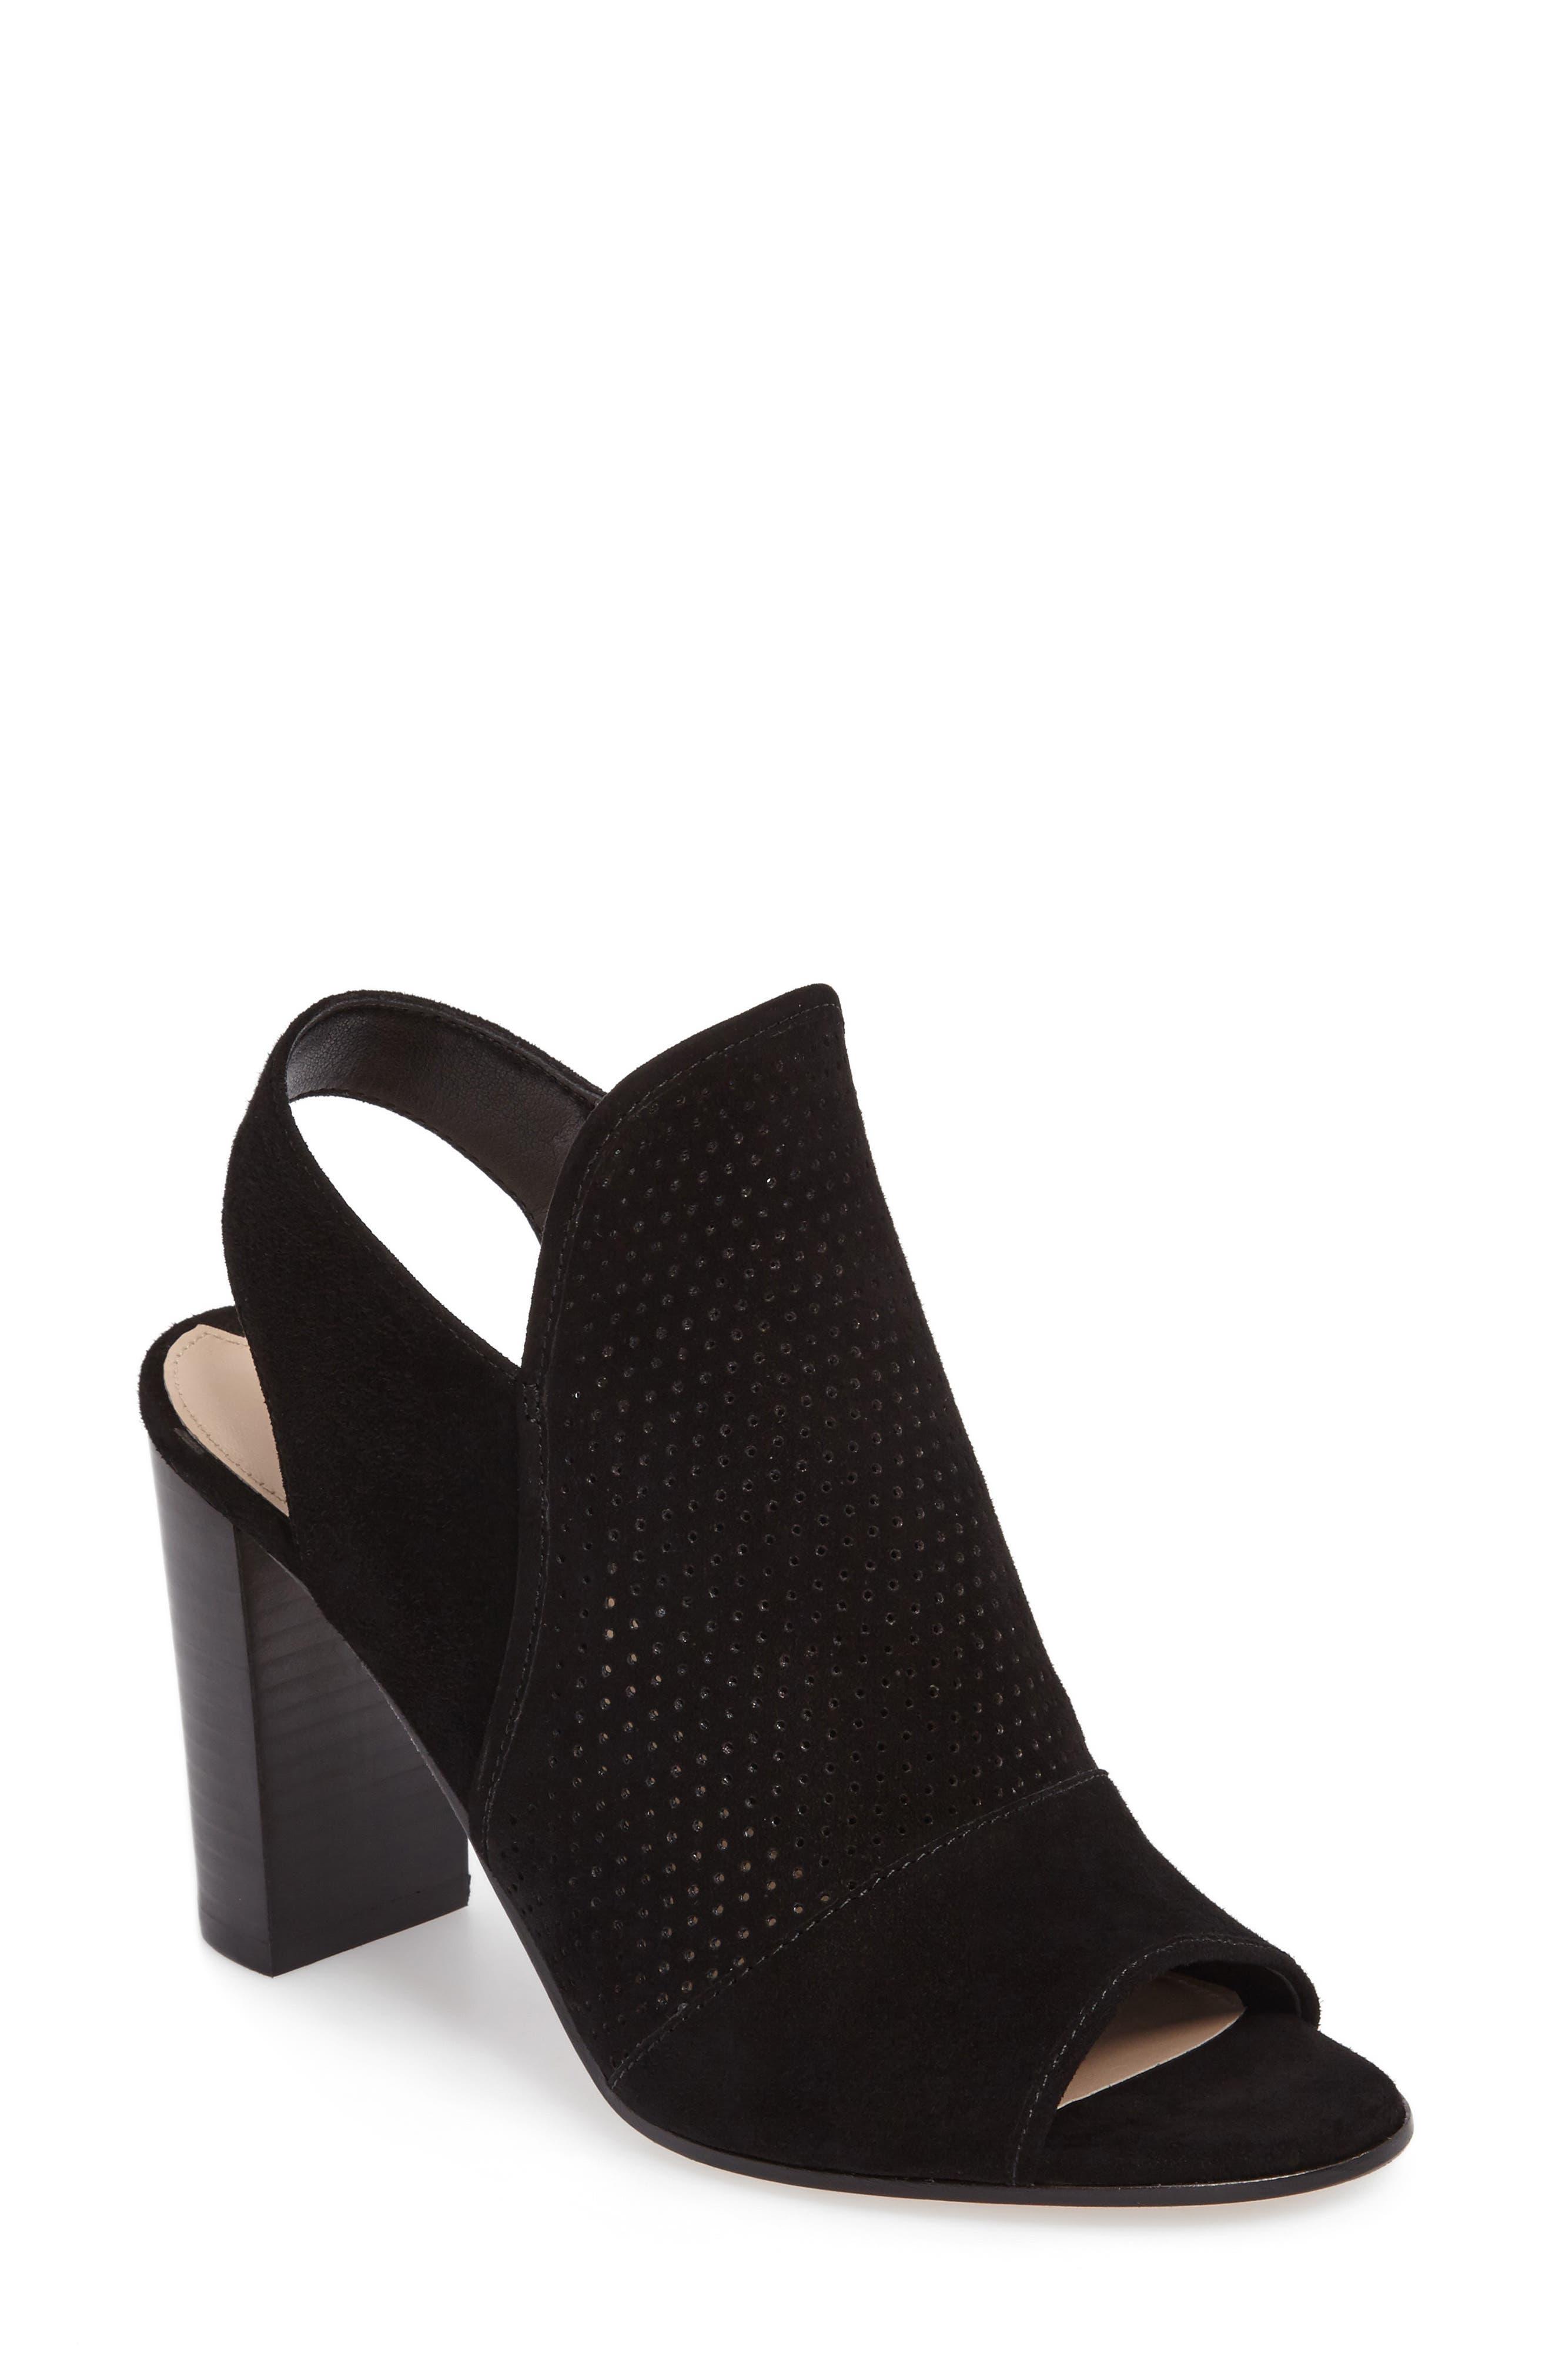 Gaze Block Heel Sandal,                             Main thumbnail 1, color,                             001